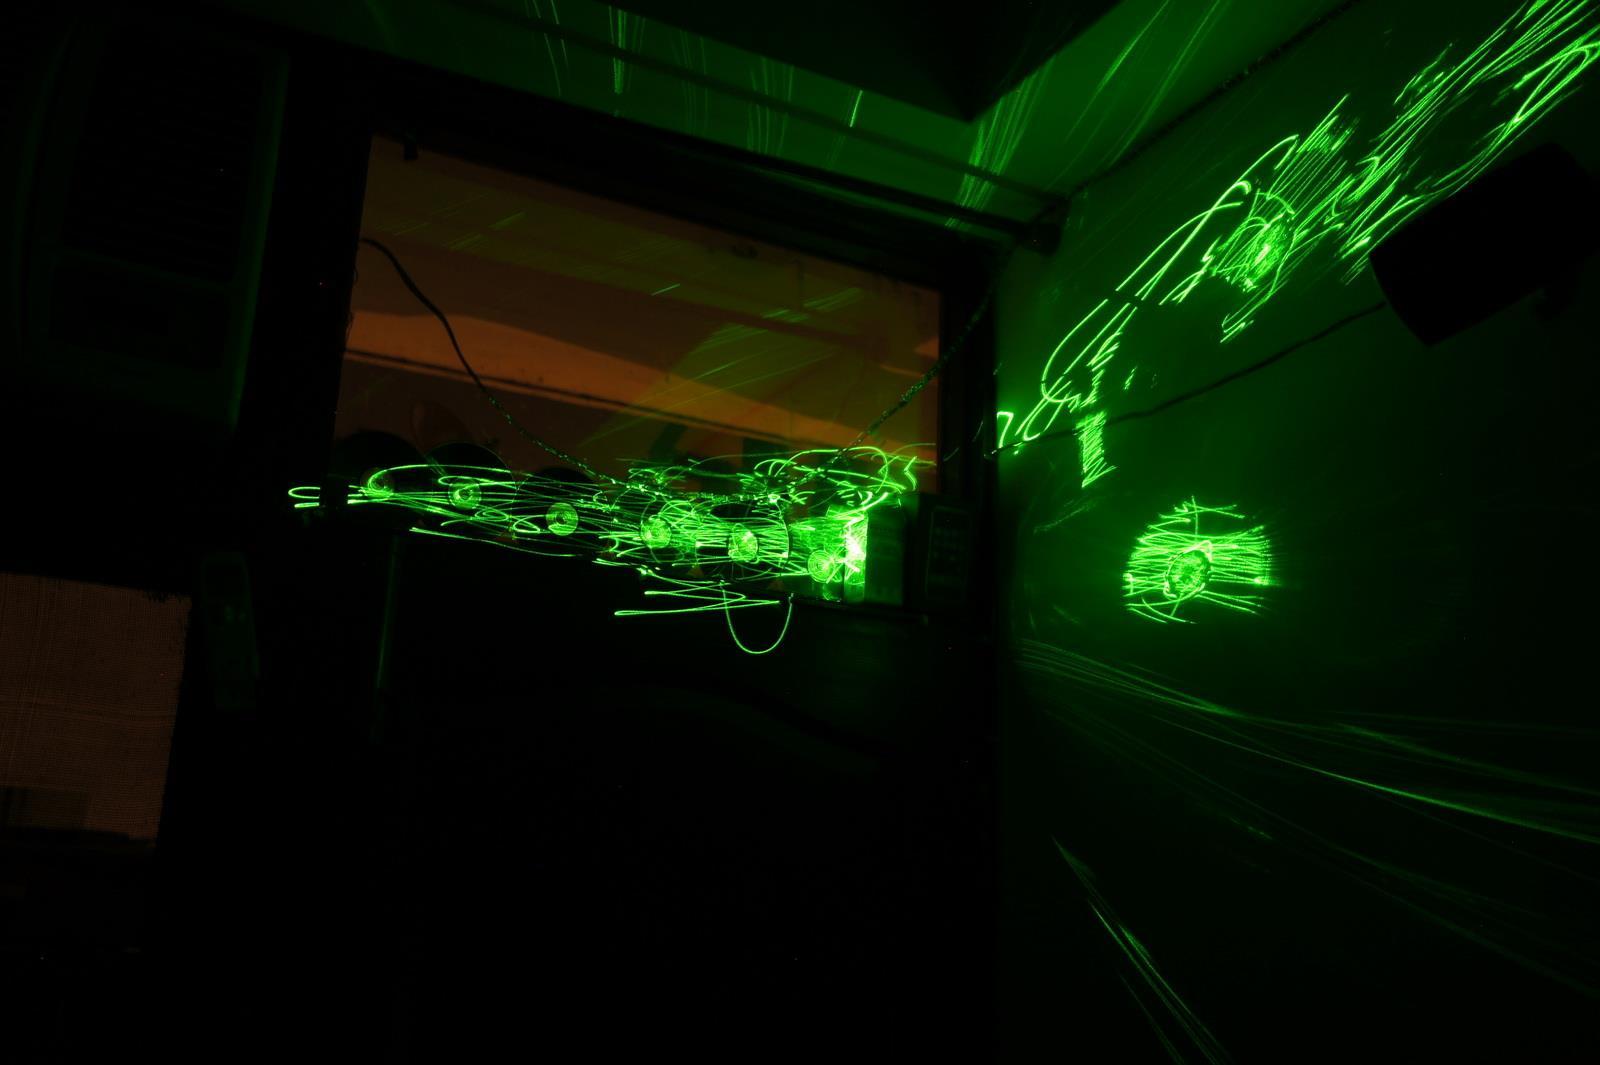 Green Laser Light Painting